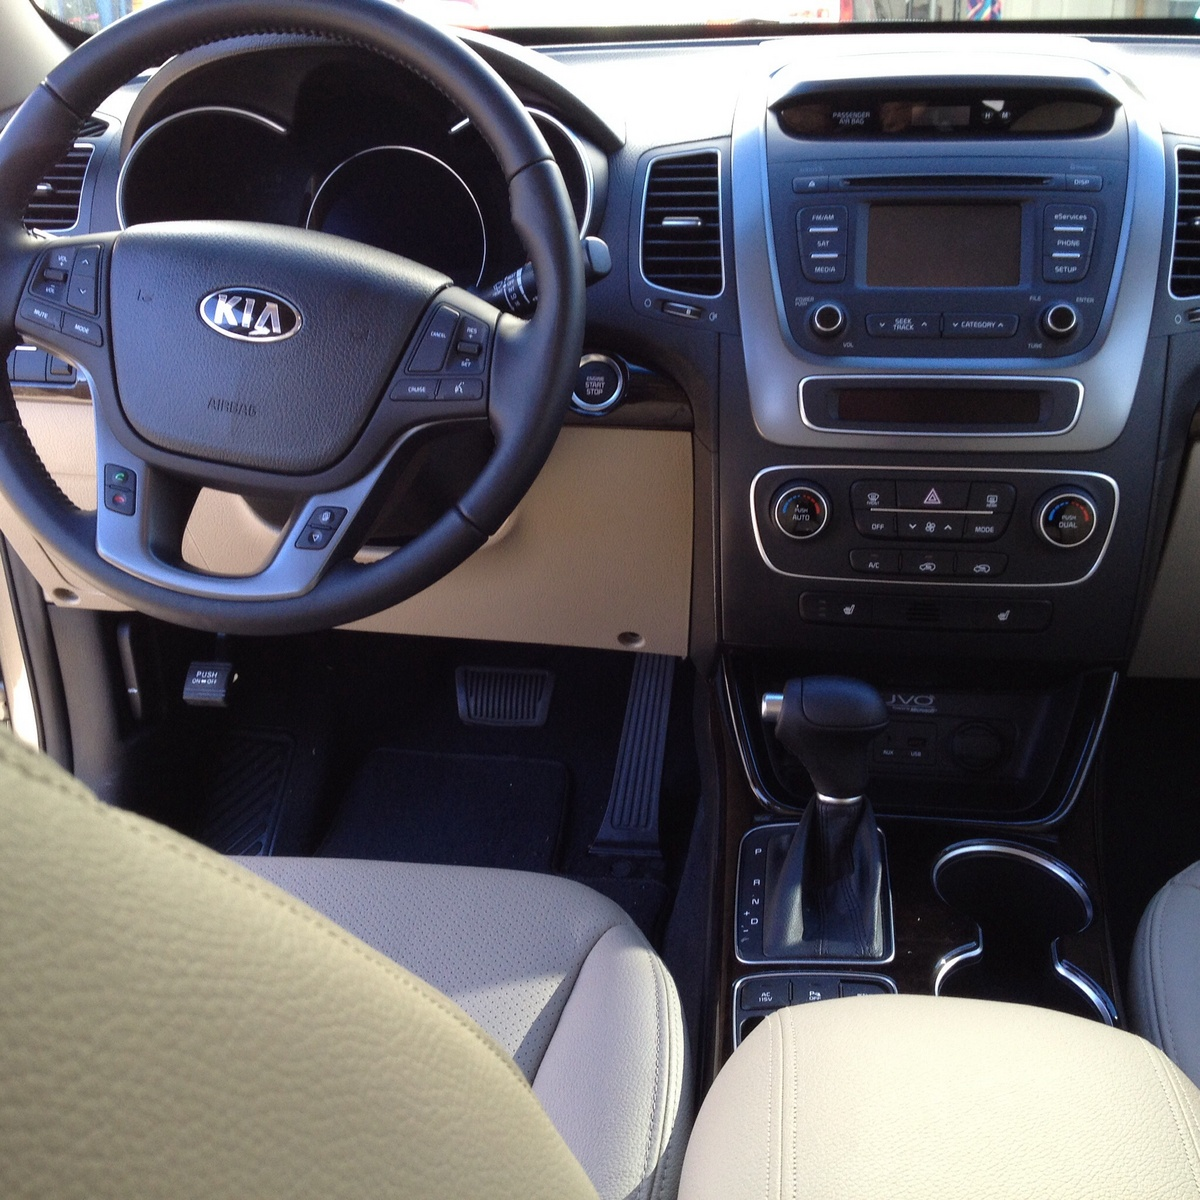 2013 Kia Sportage Ex: 2014 Kia Sorento